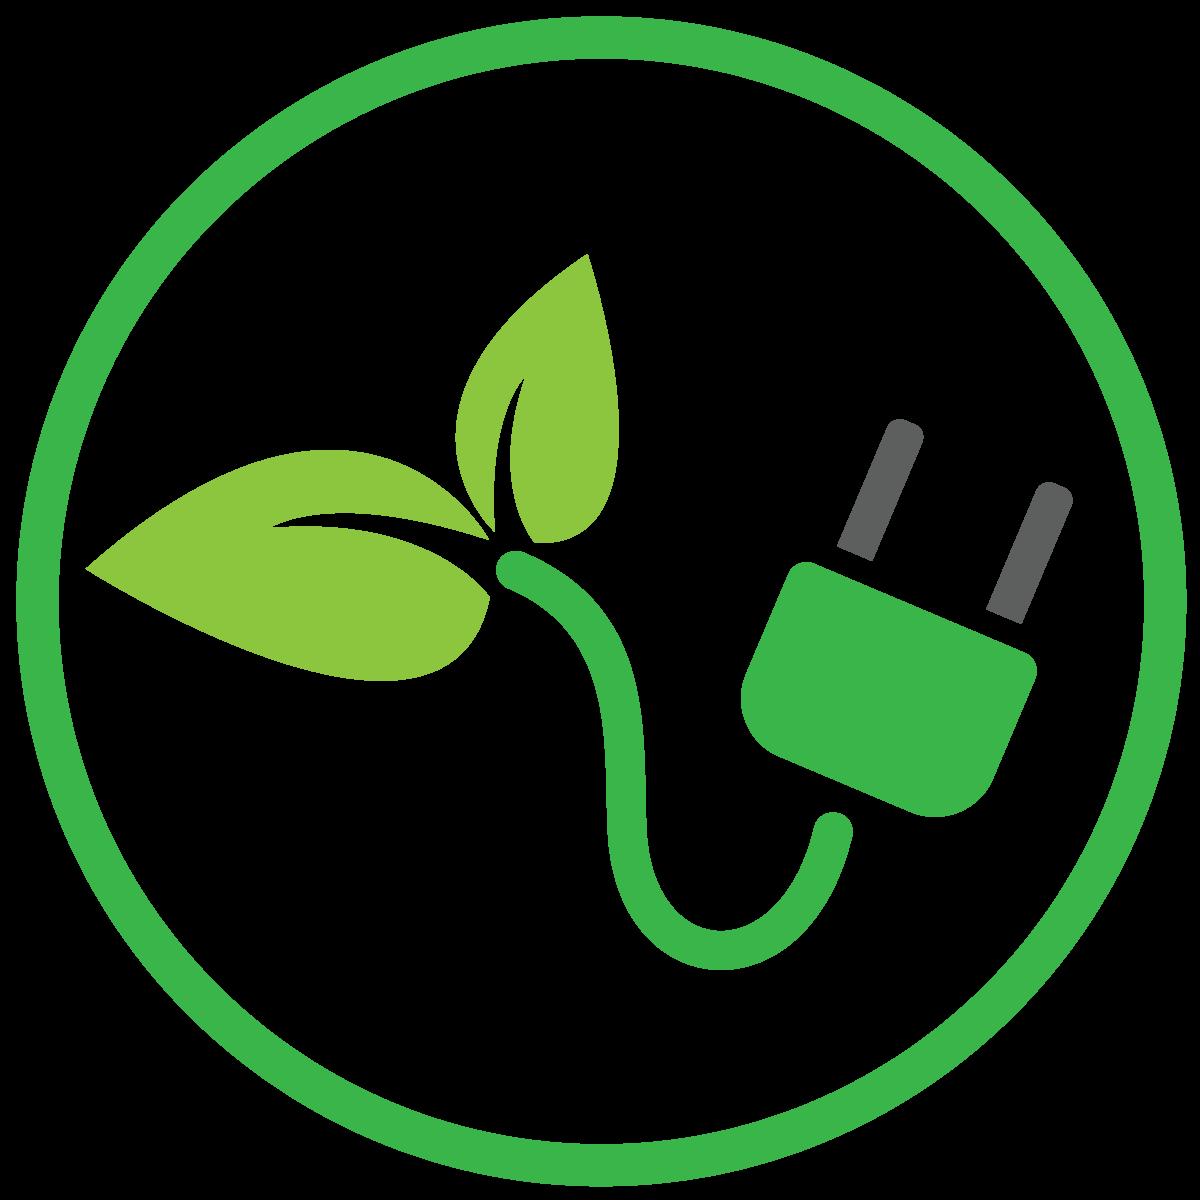 Energy Clipart Environmental Sustainability Energy